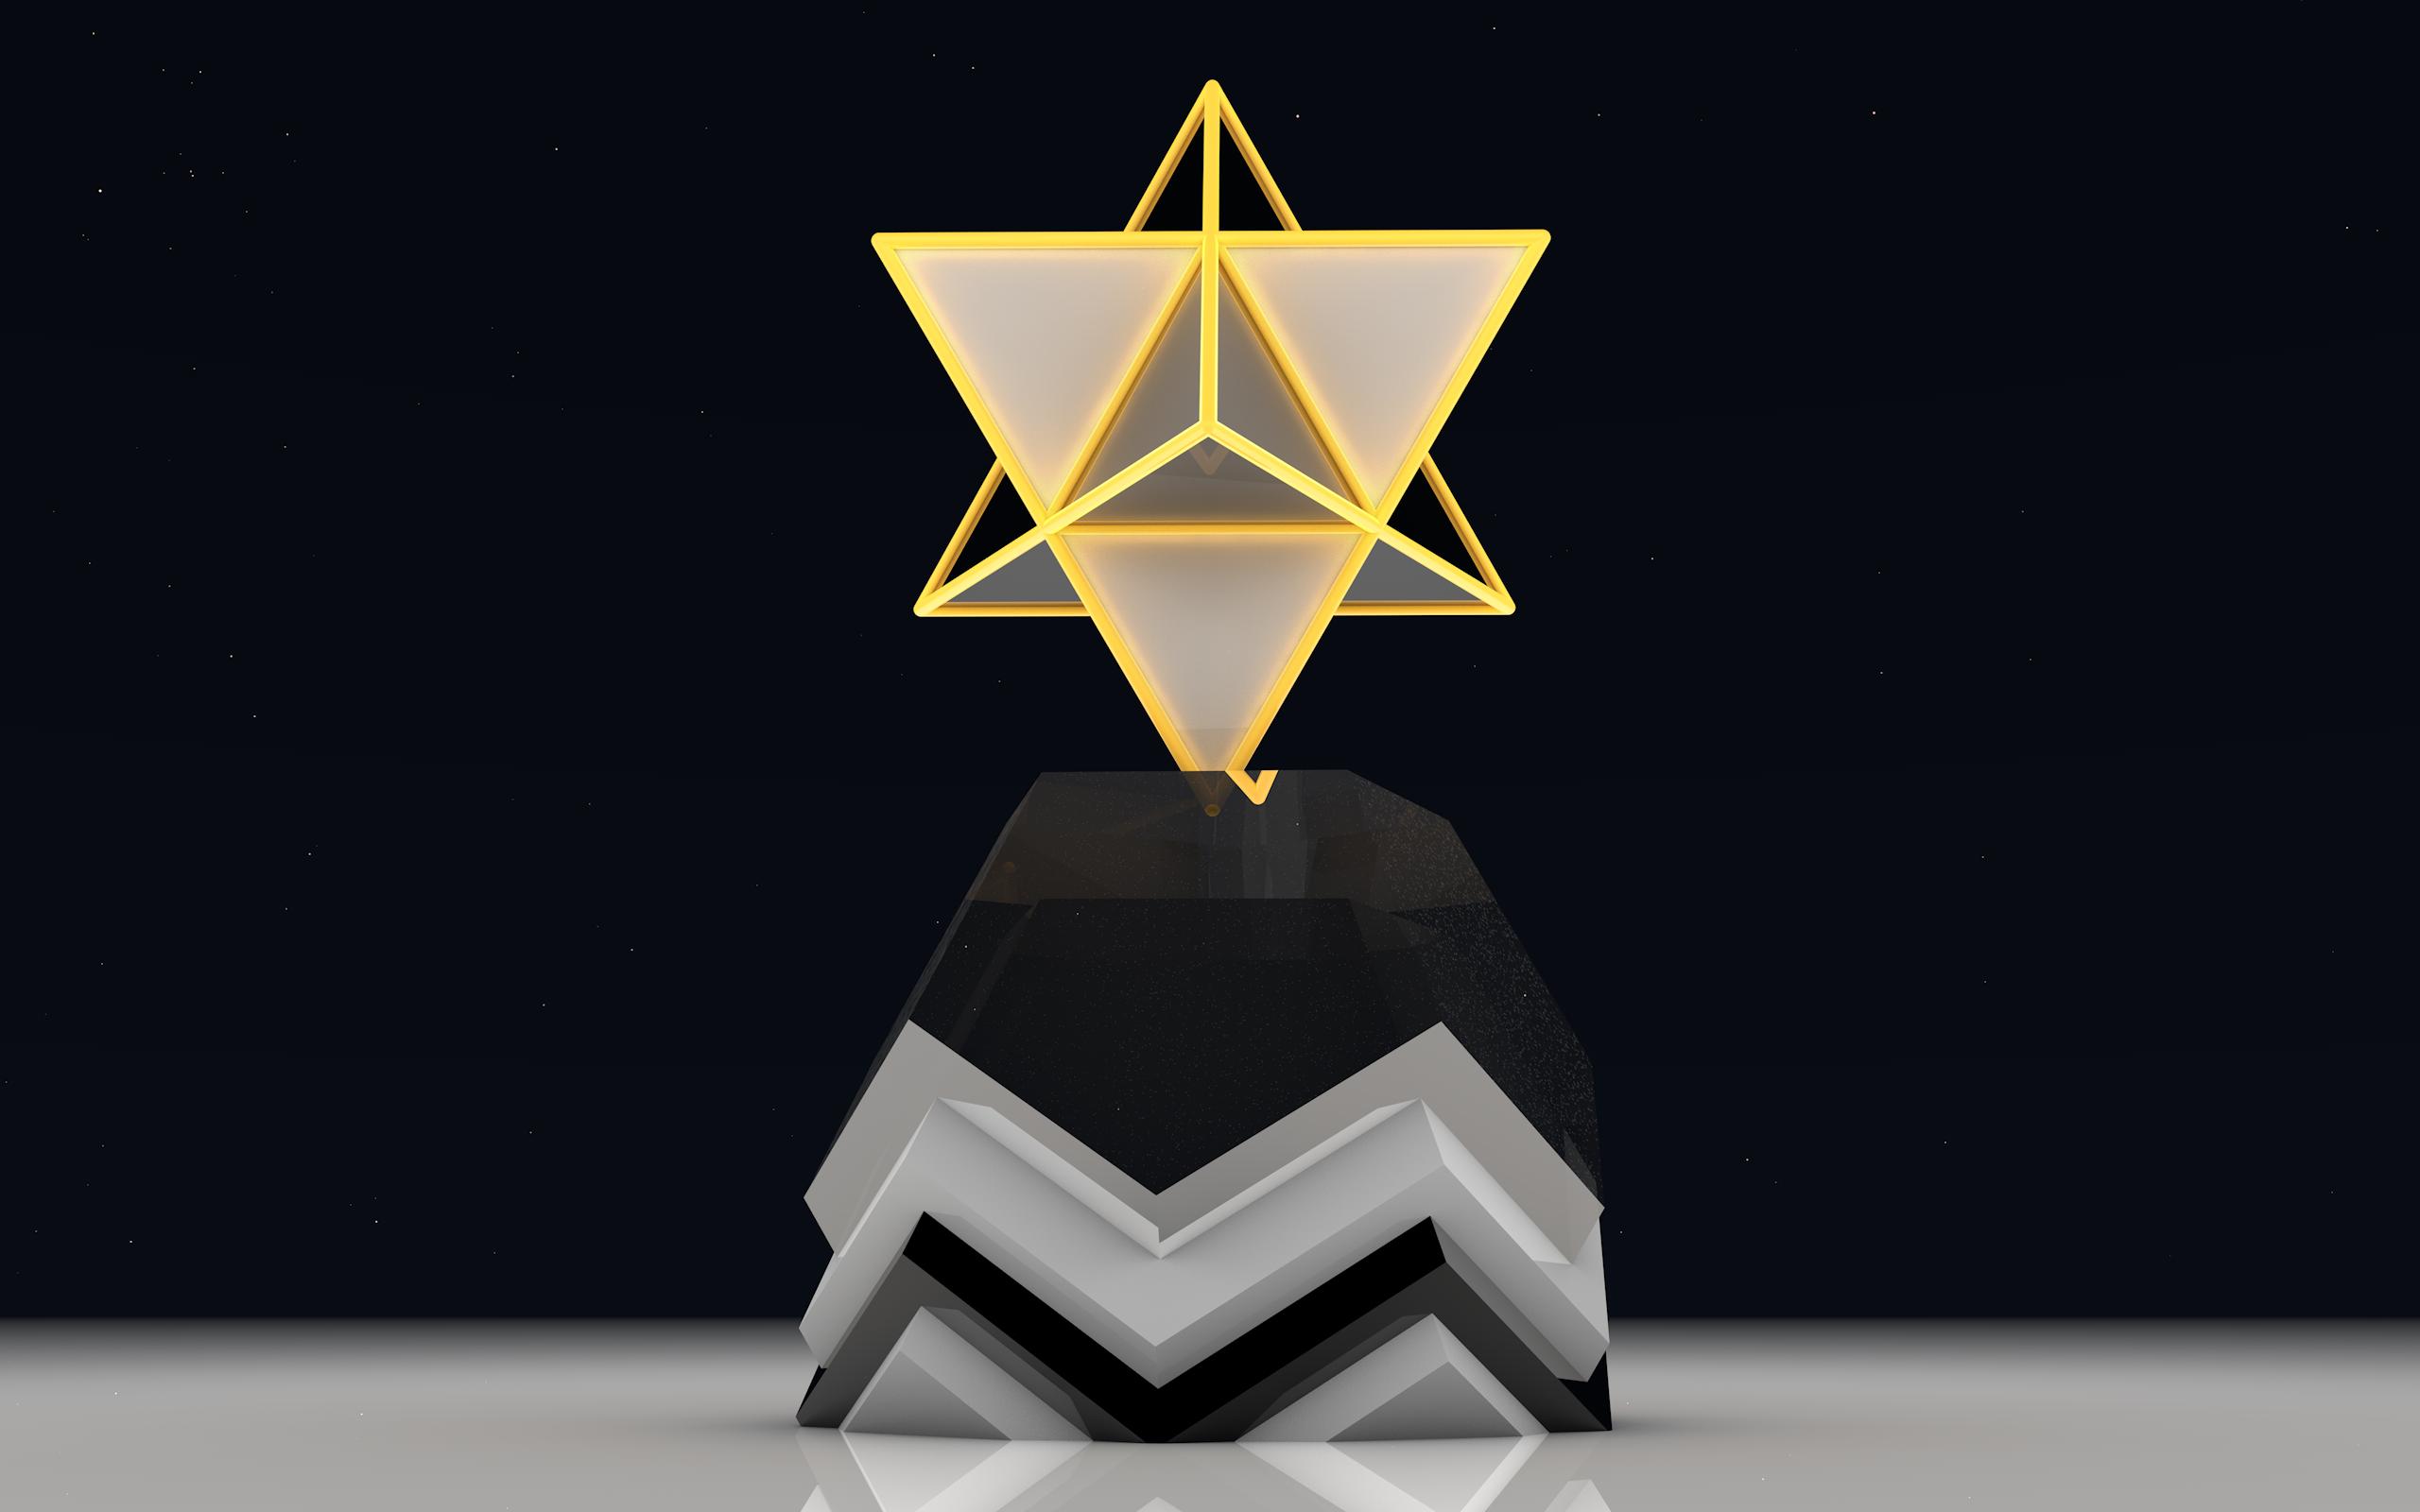 Star Tetrahedron By Lithium Polygon